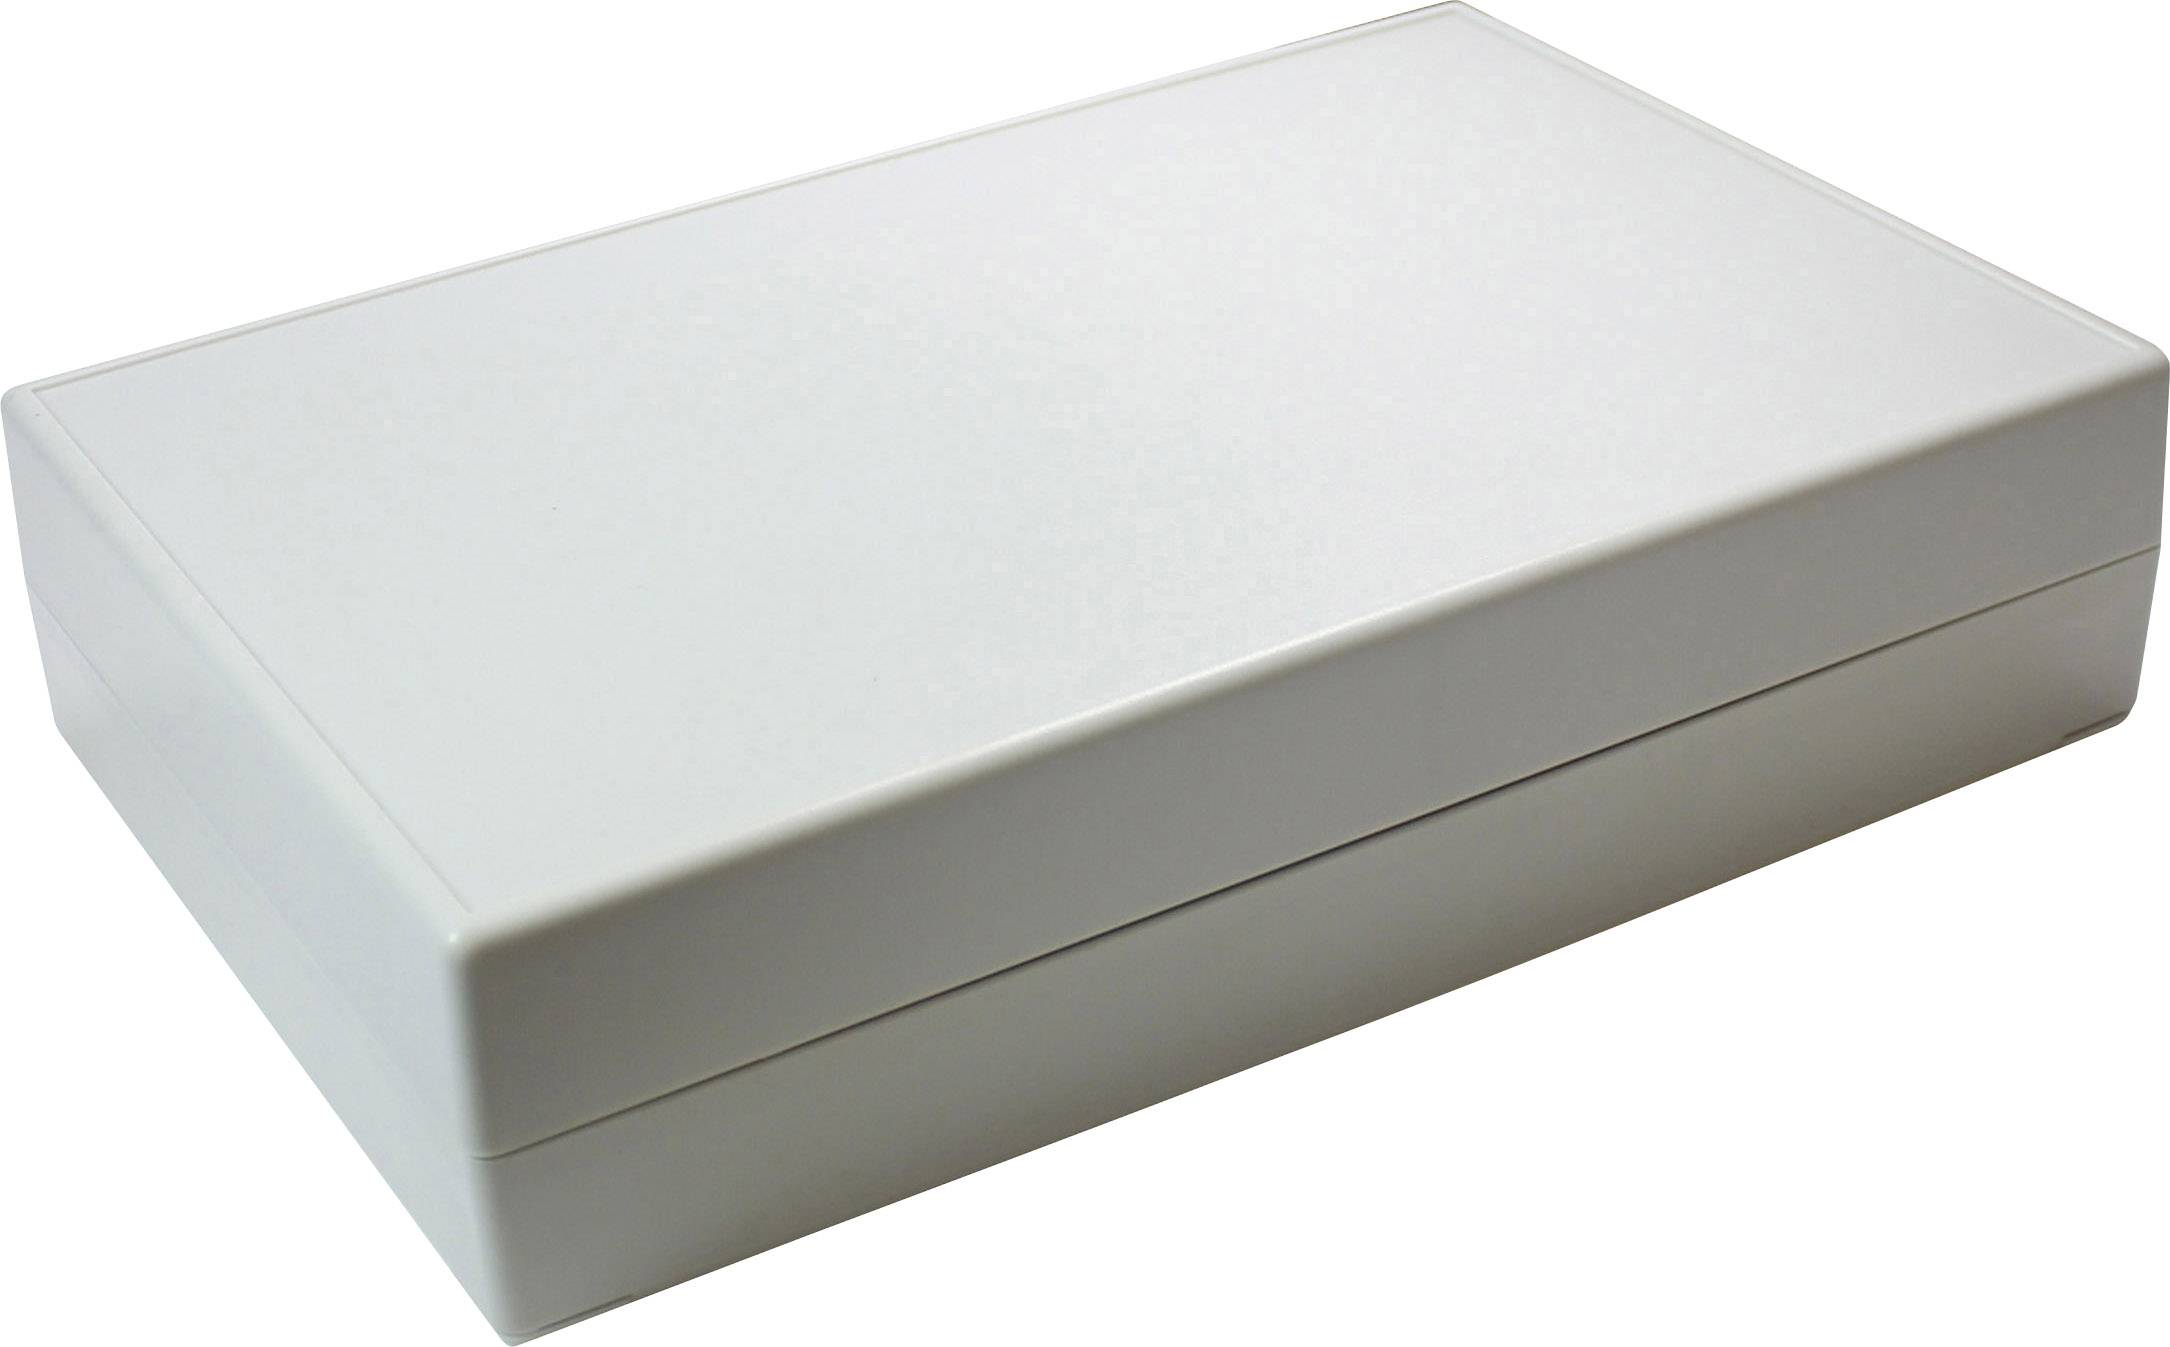 Stolní pouzdro ABS Axxatronic GEH.-SERIE 70 - 220X145X50, (d x š x v) 220 x 145 x 50 mm, šedá